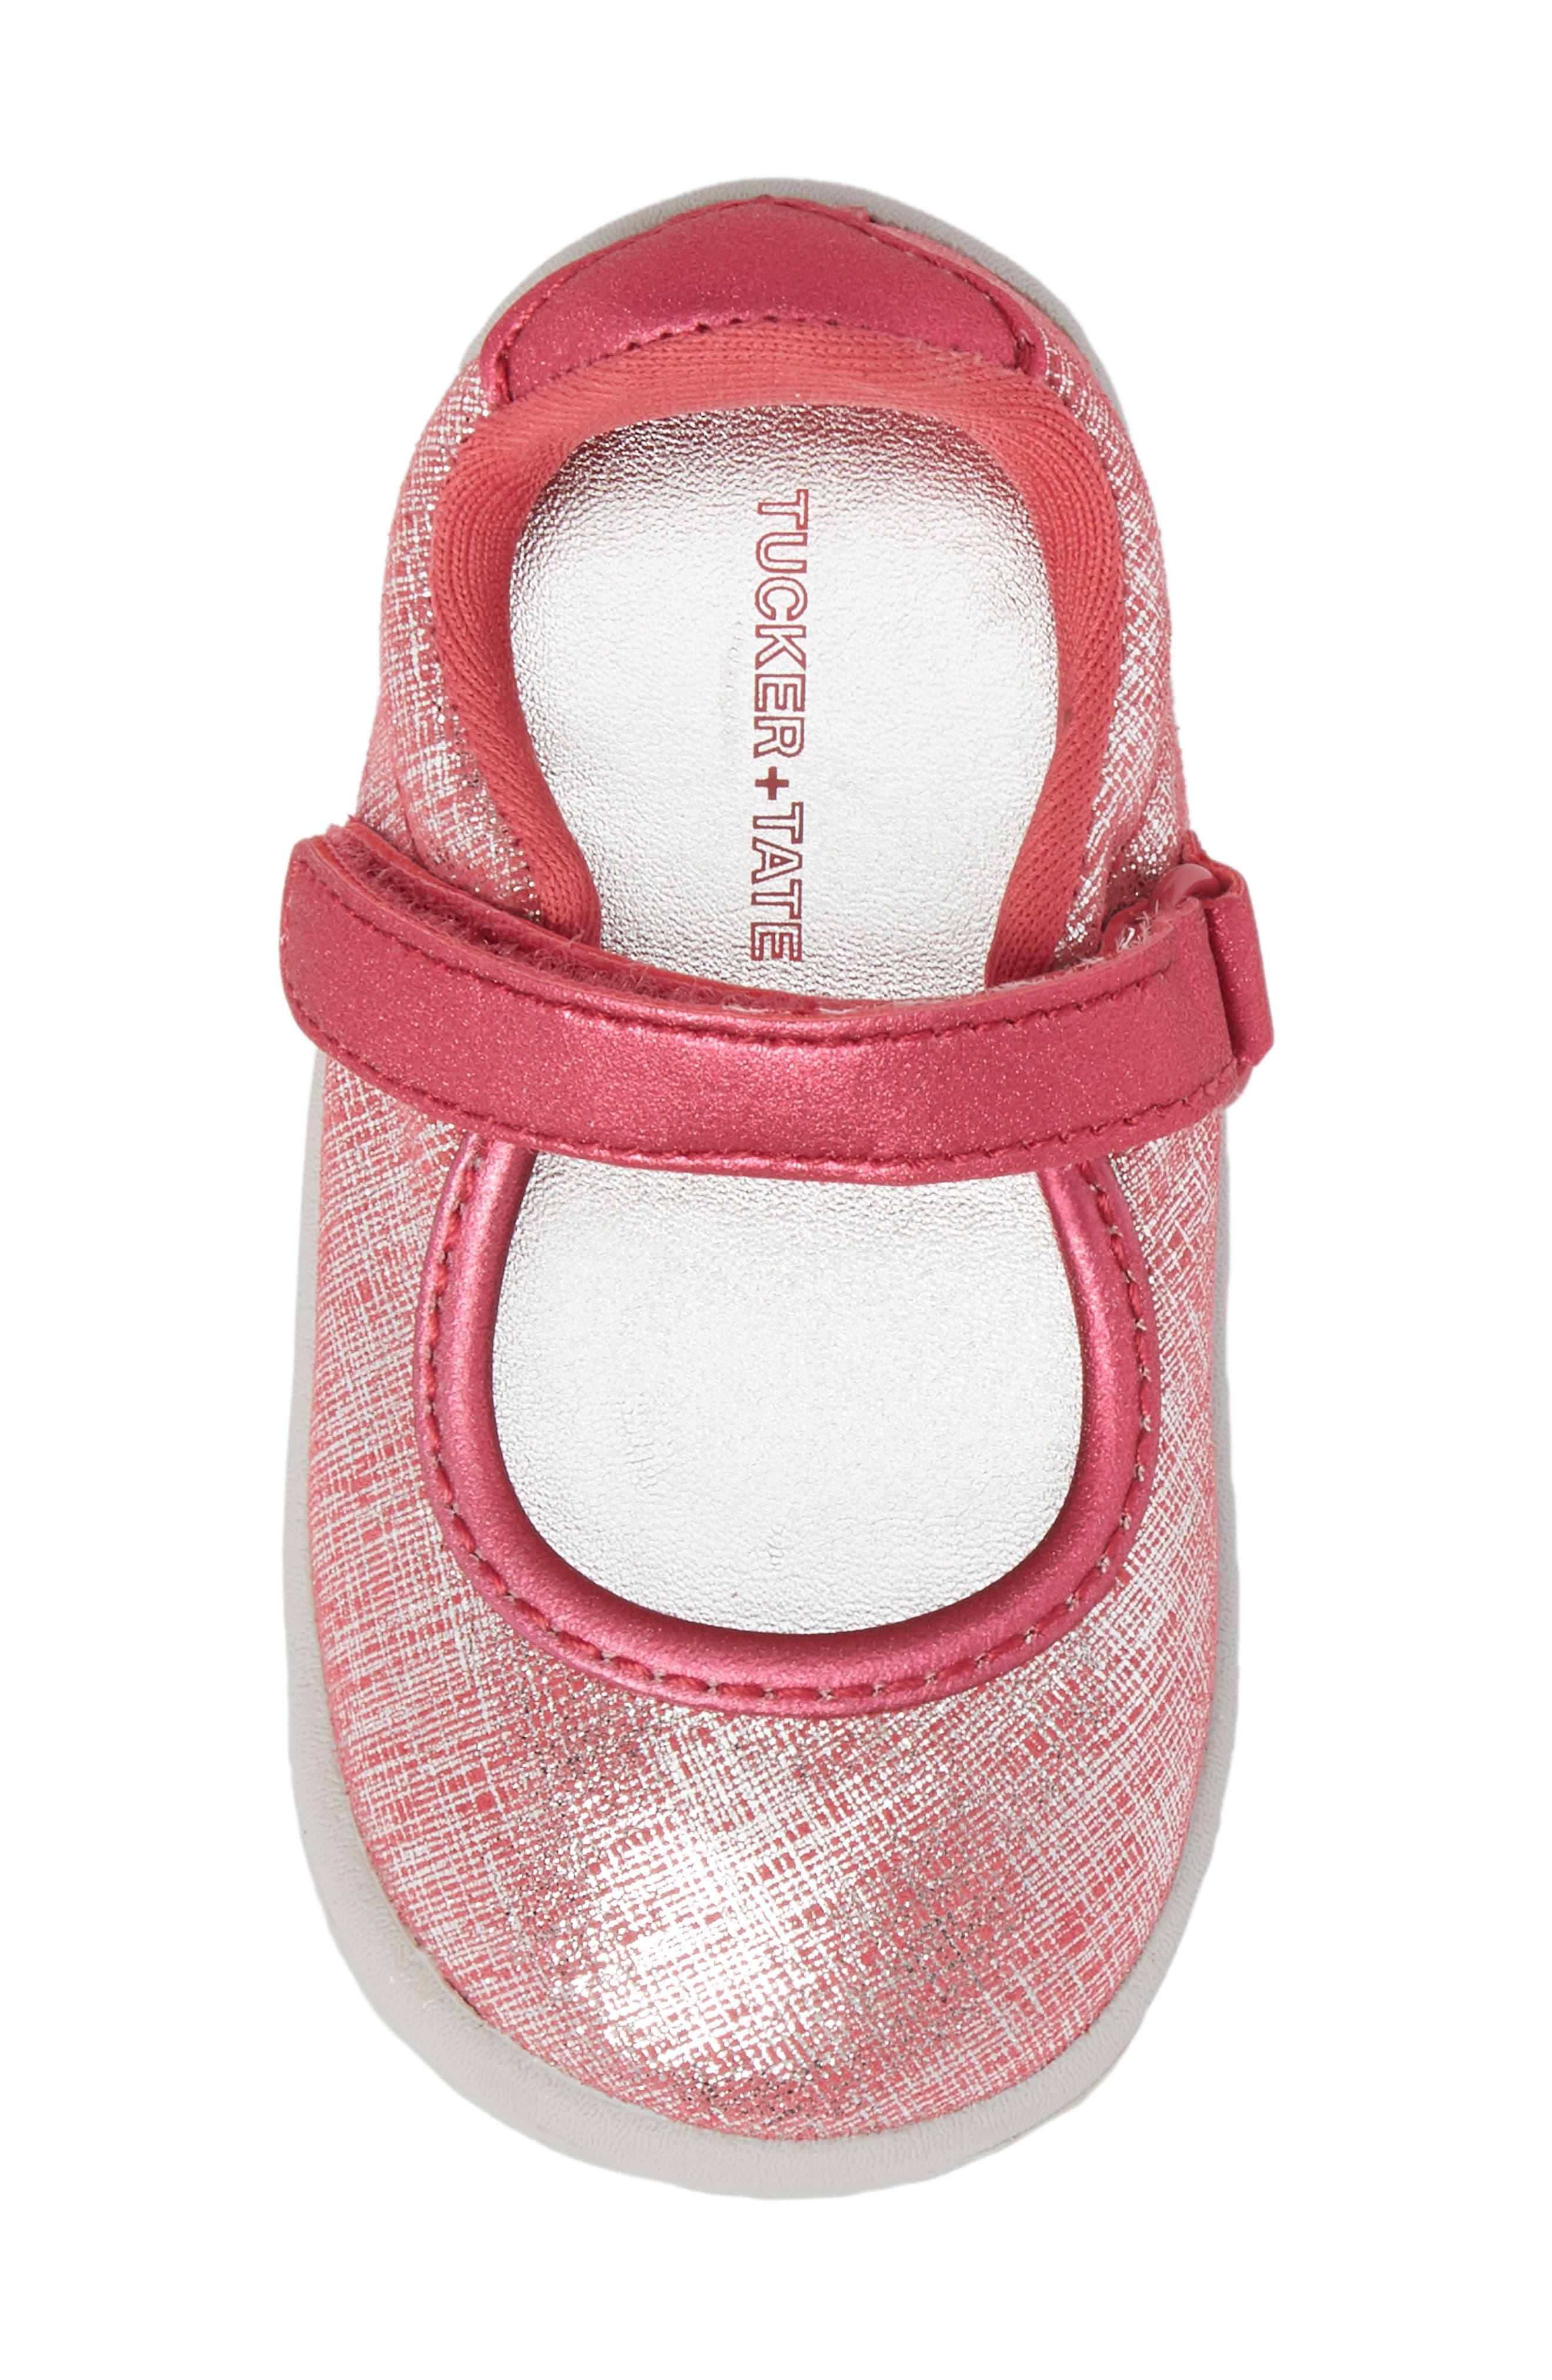 Nora Metallic Mary Jane Sneaker,                             Alternate thumbnail 5, color,                             650